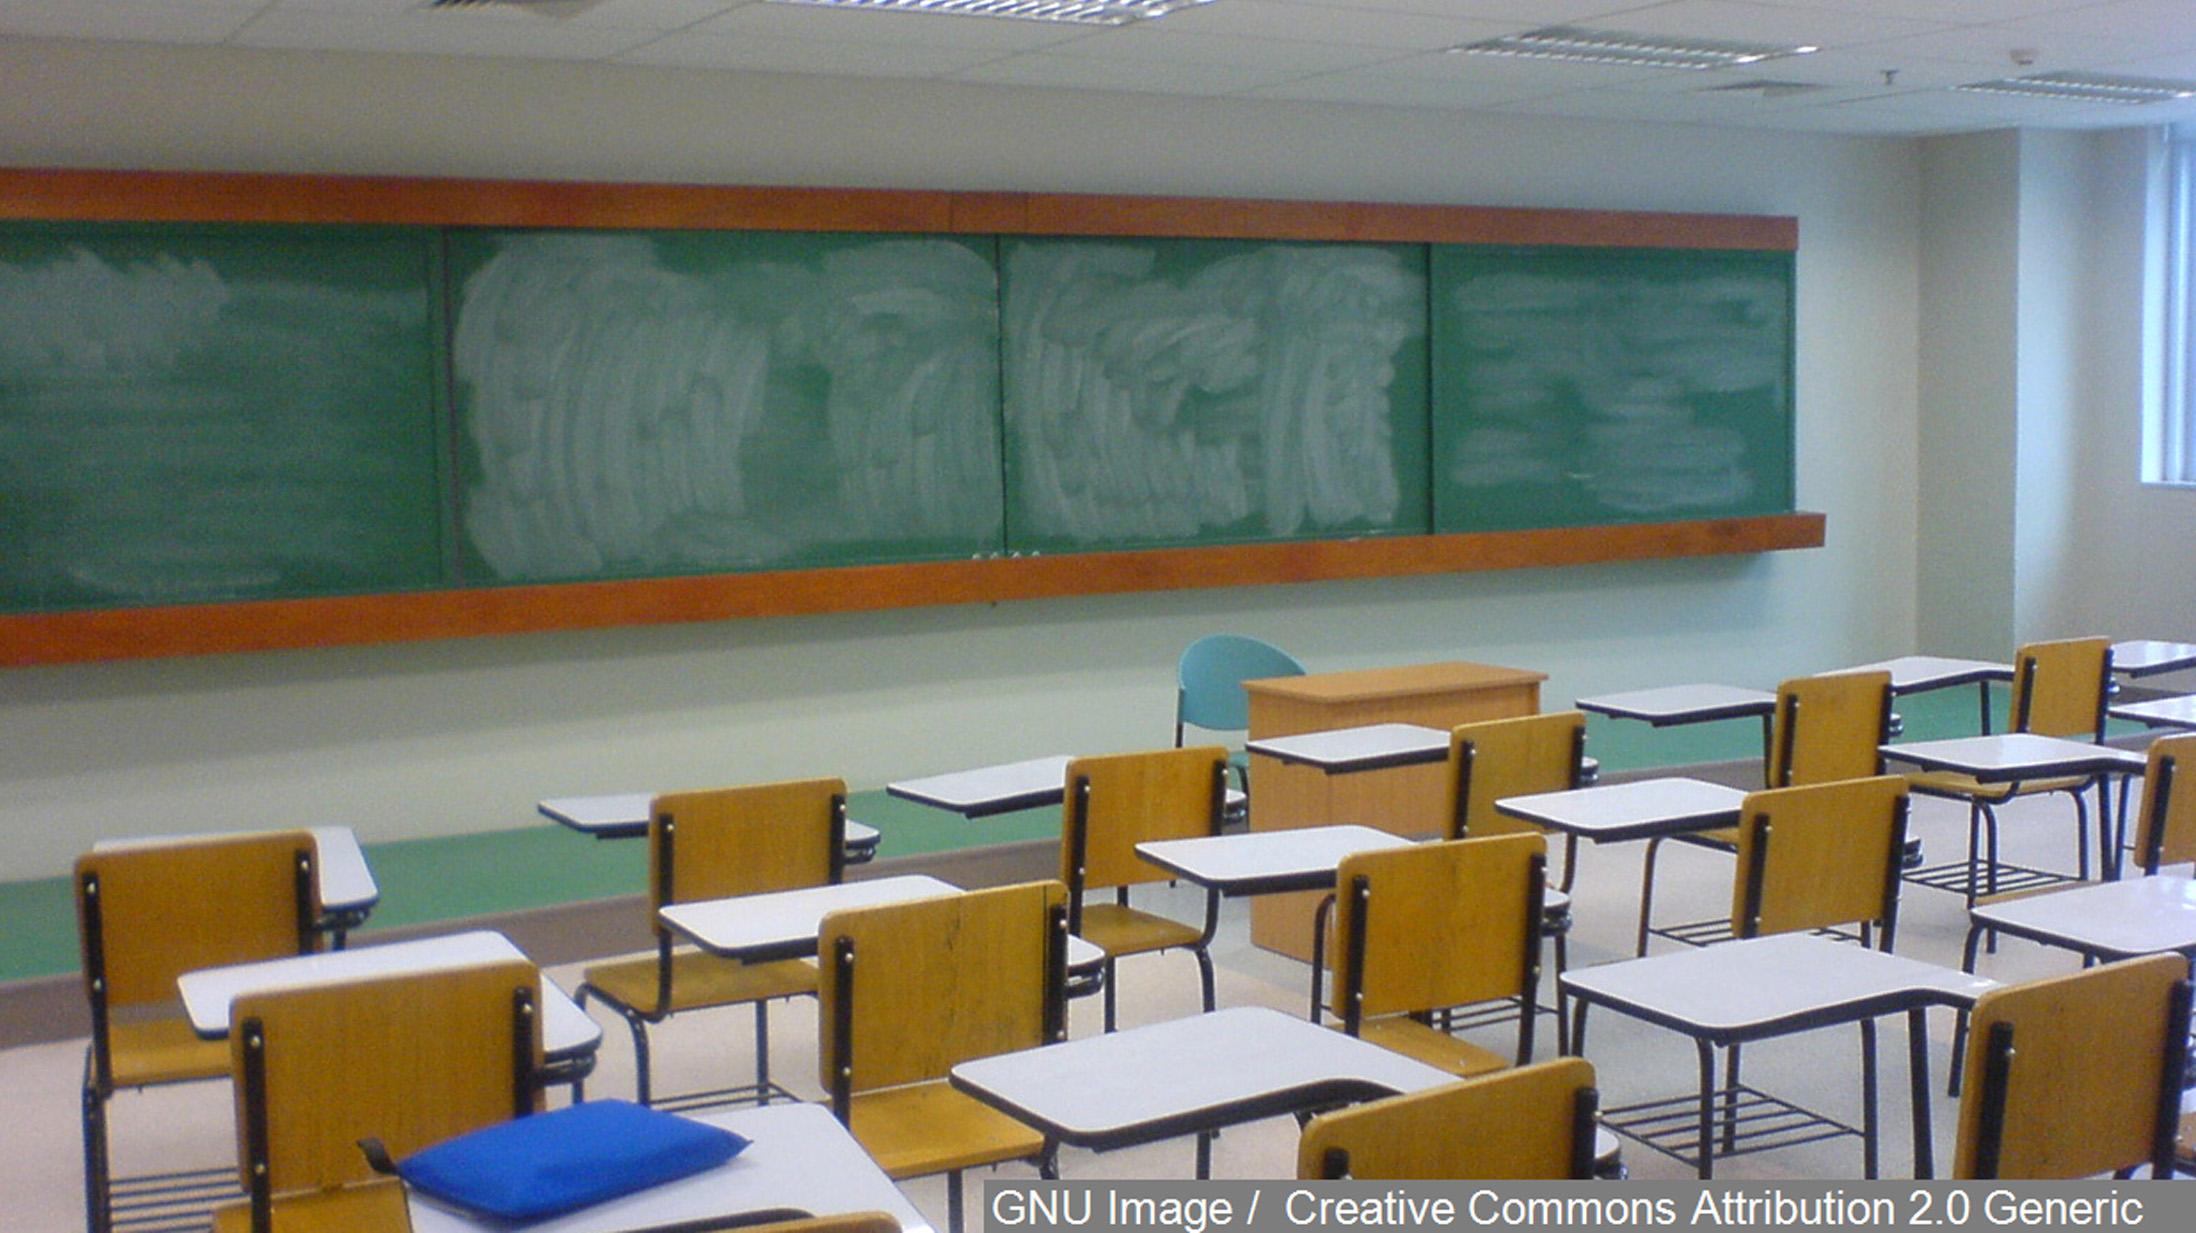 Classroom 10122015_1469850700950.jpg